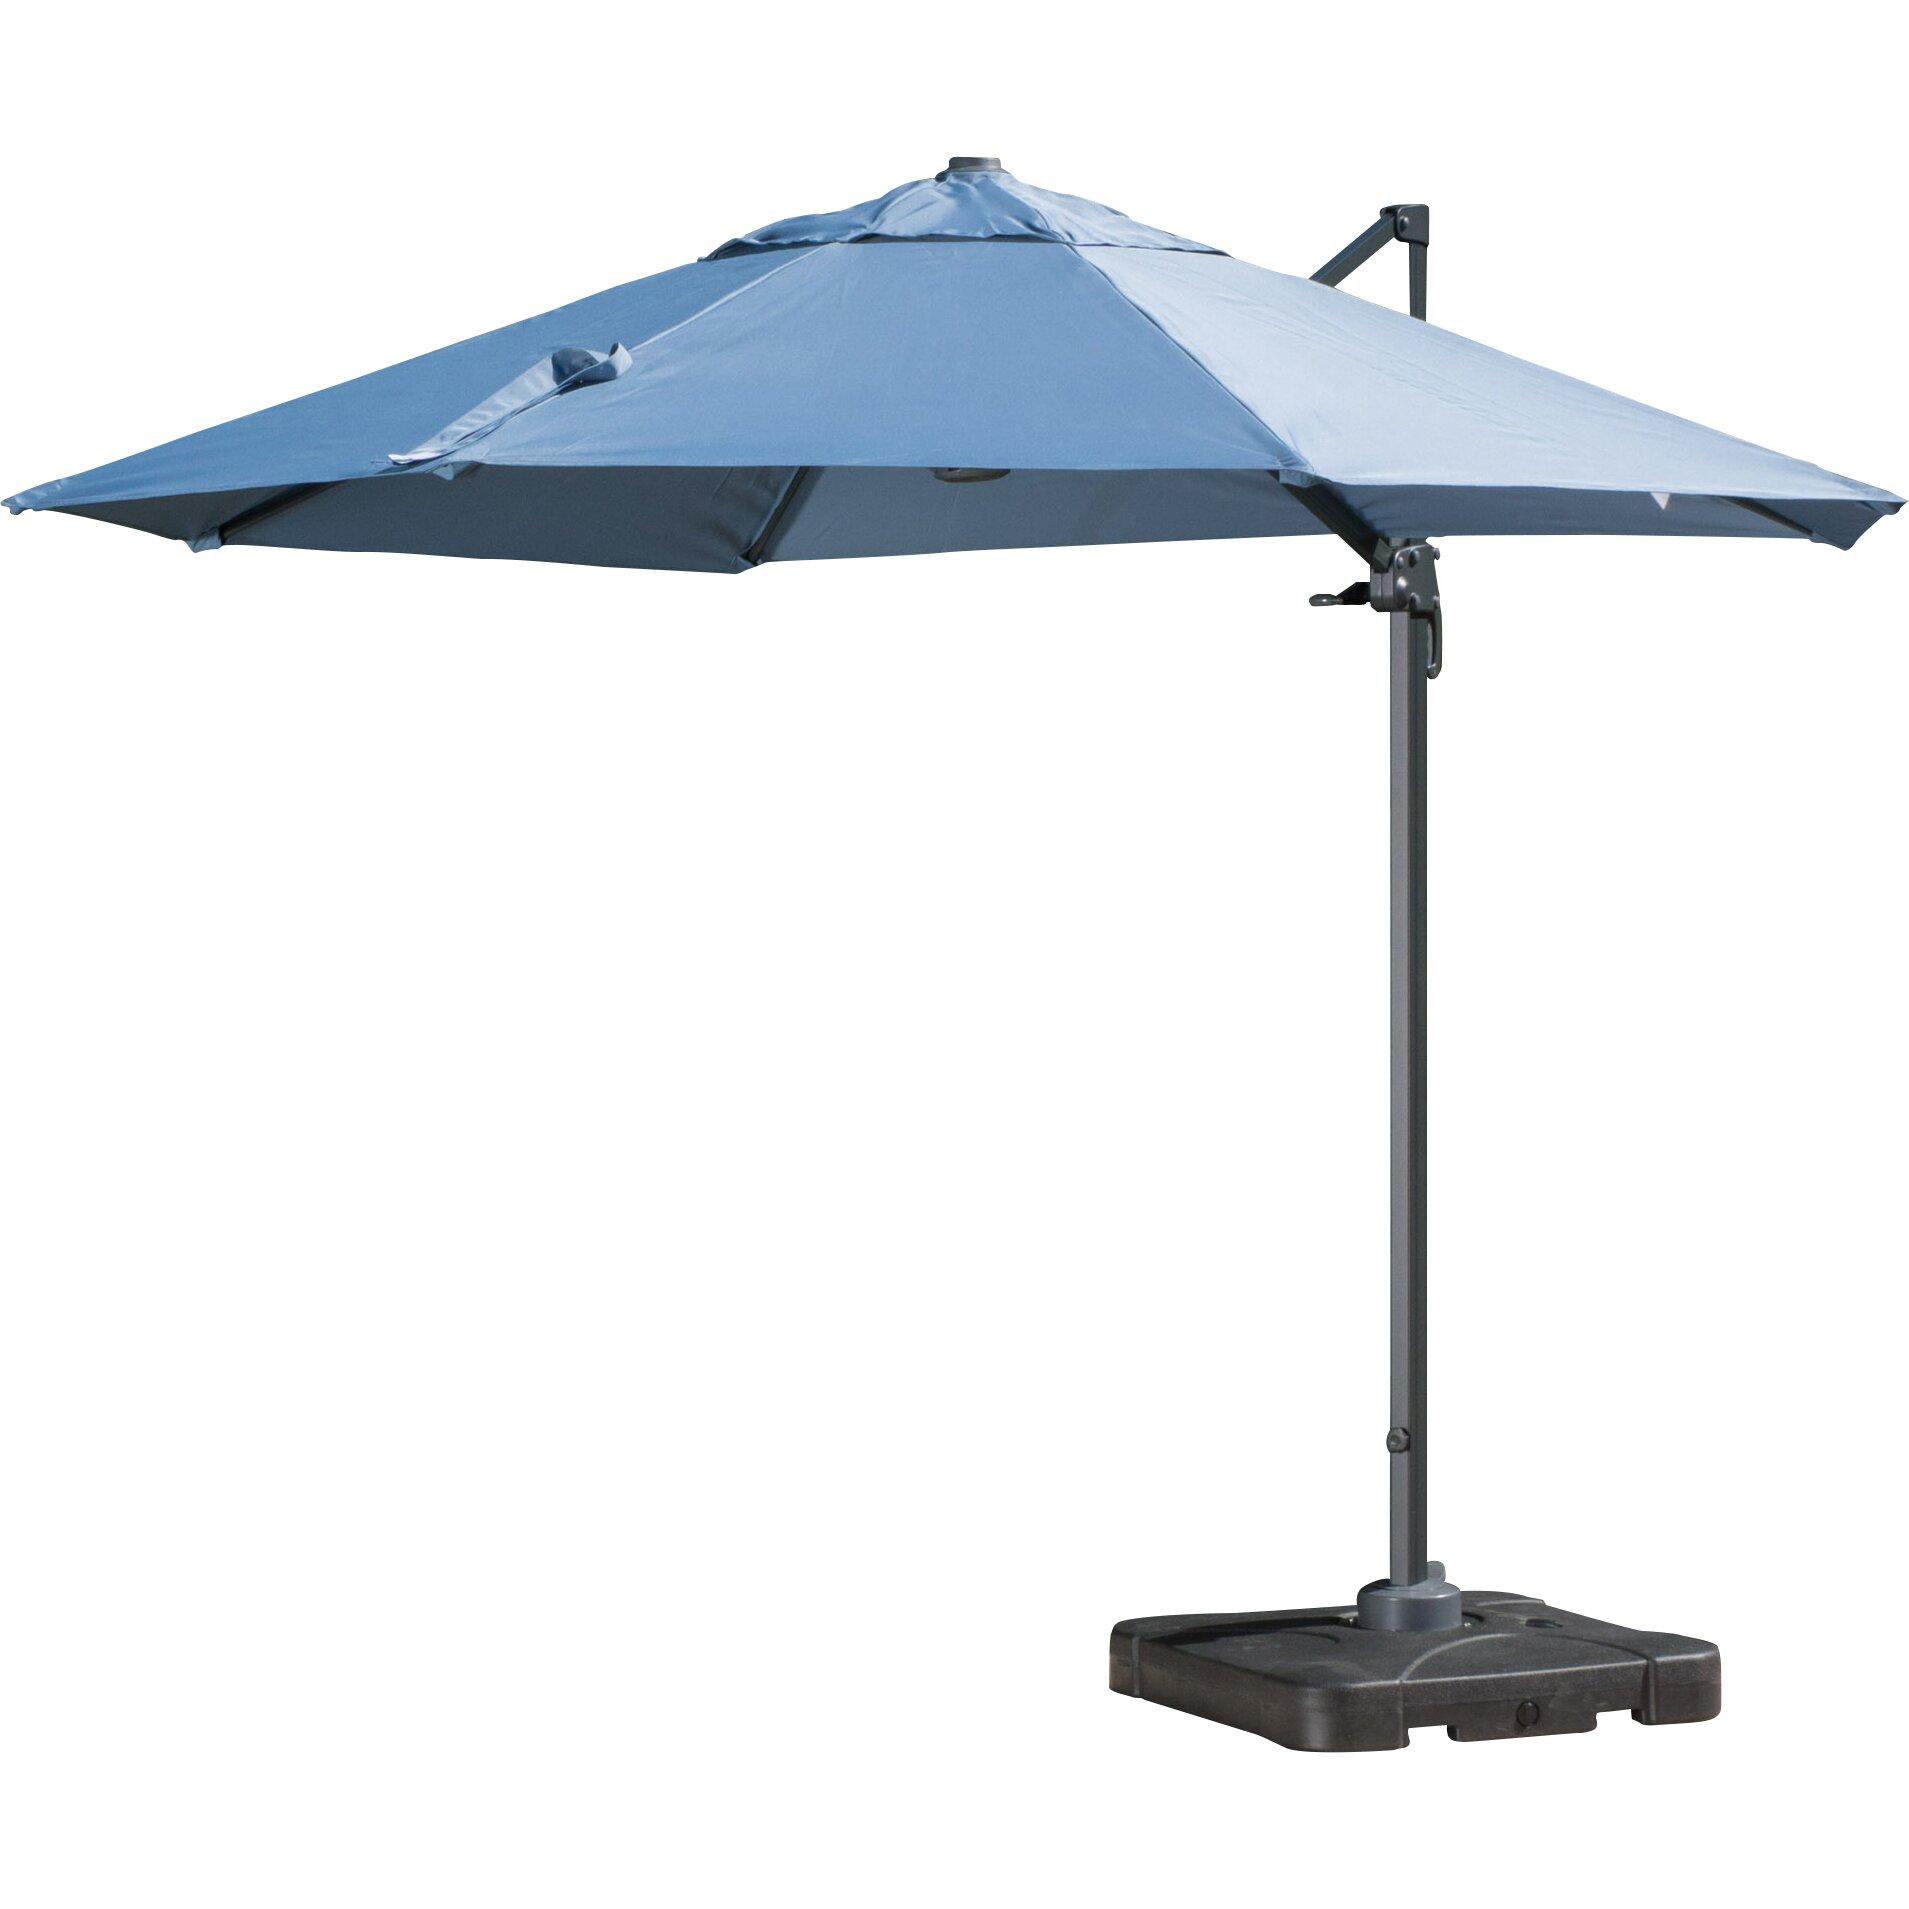 Brayden Studio 10 Cantilever Umbrella Amp Reviews Wayfair Ca